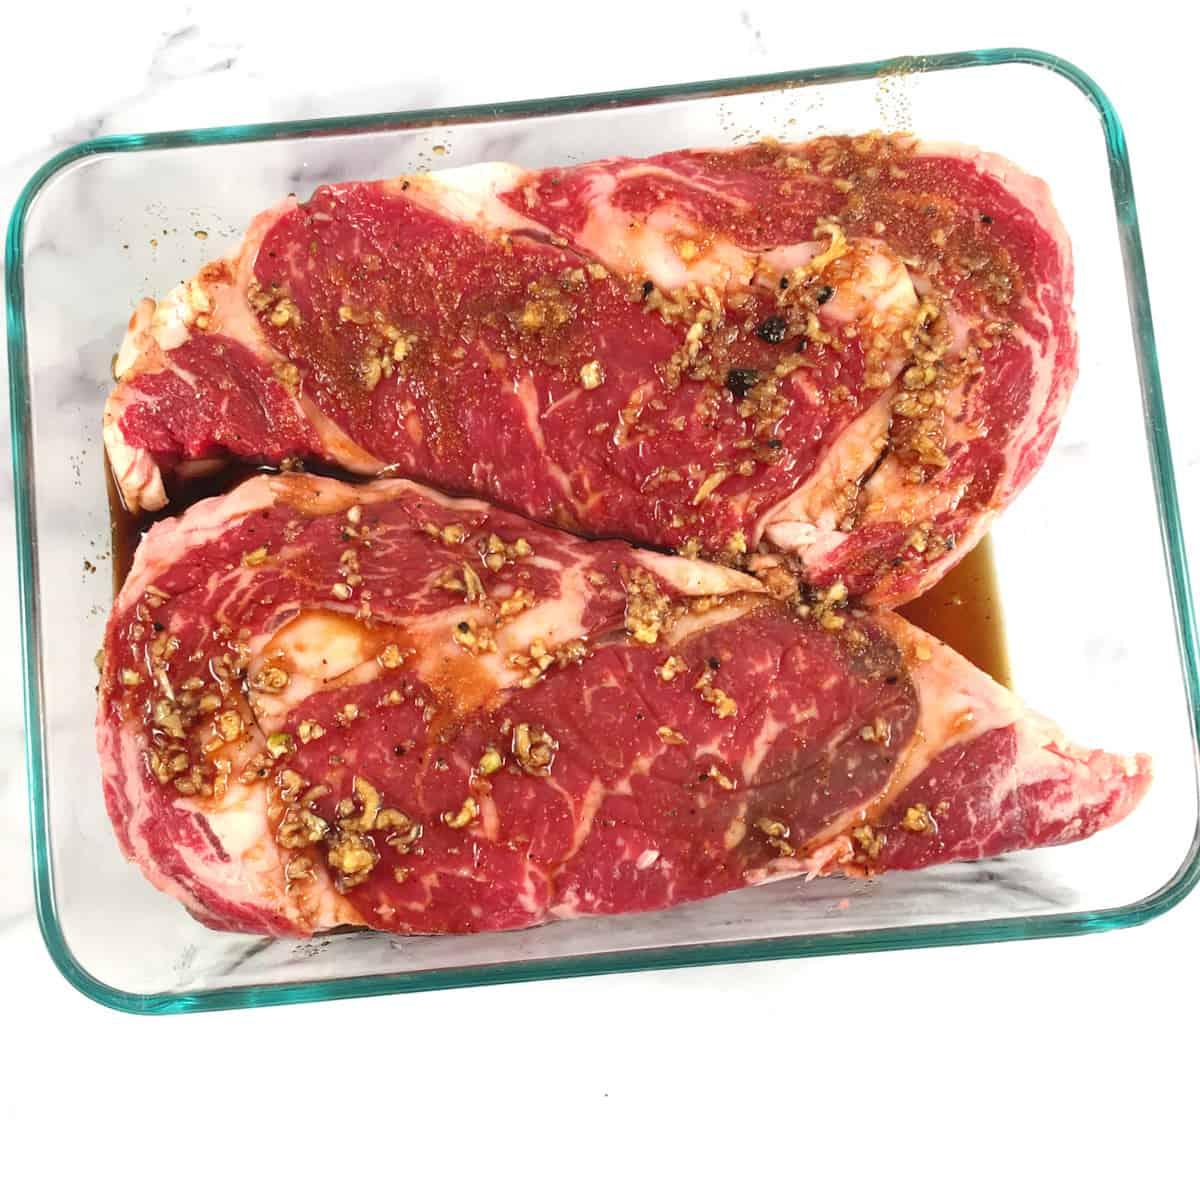 marinated rib eye steak